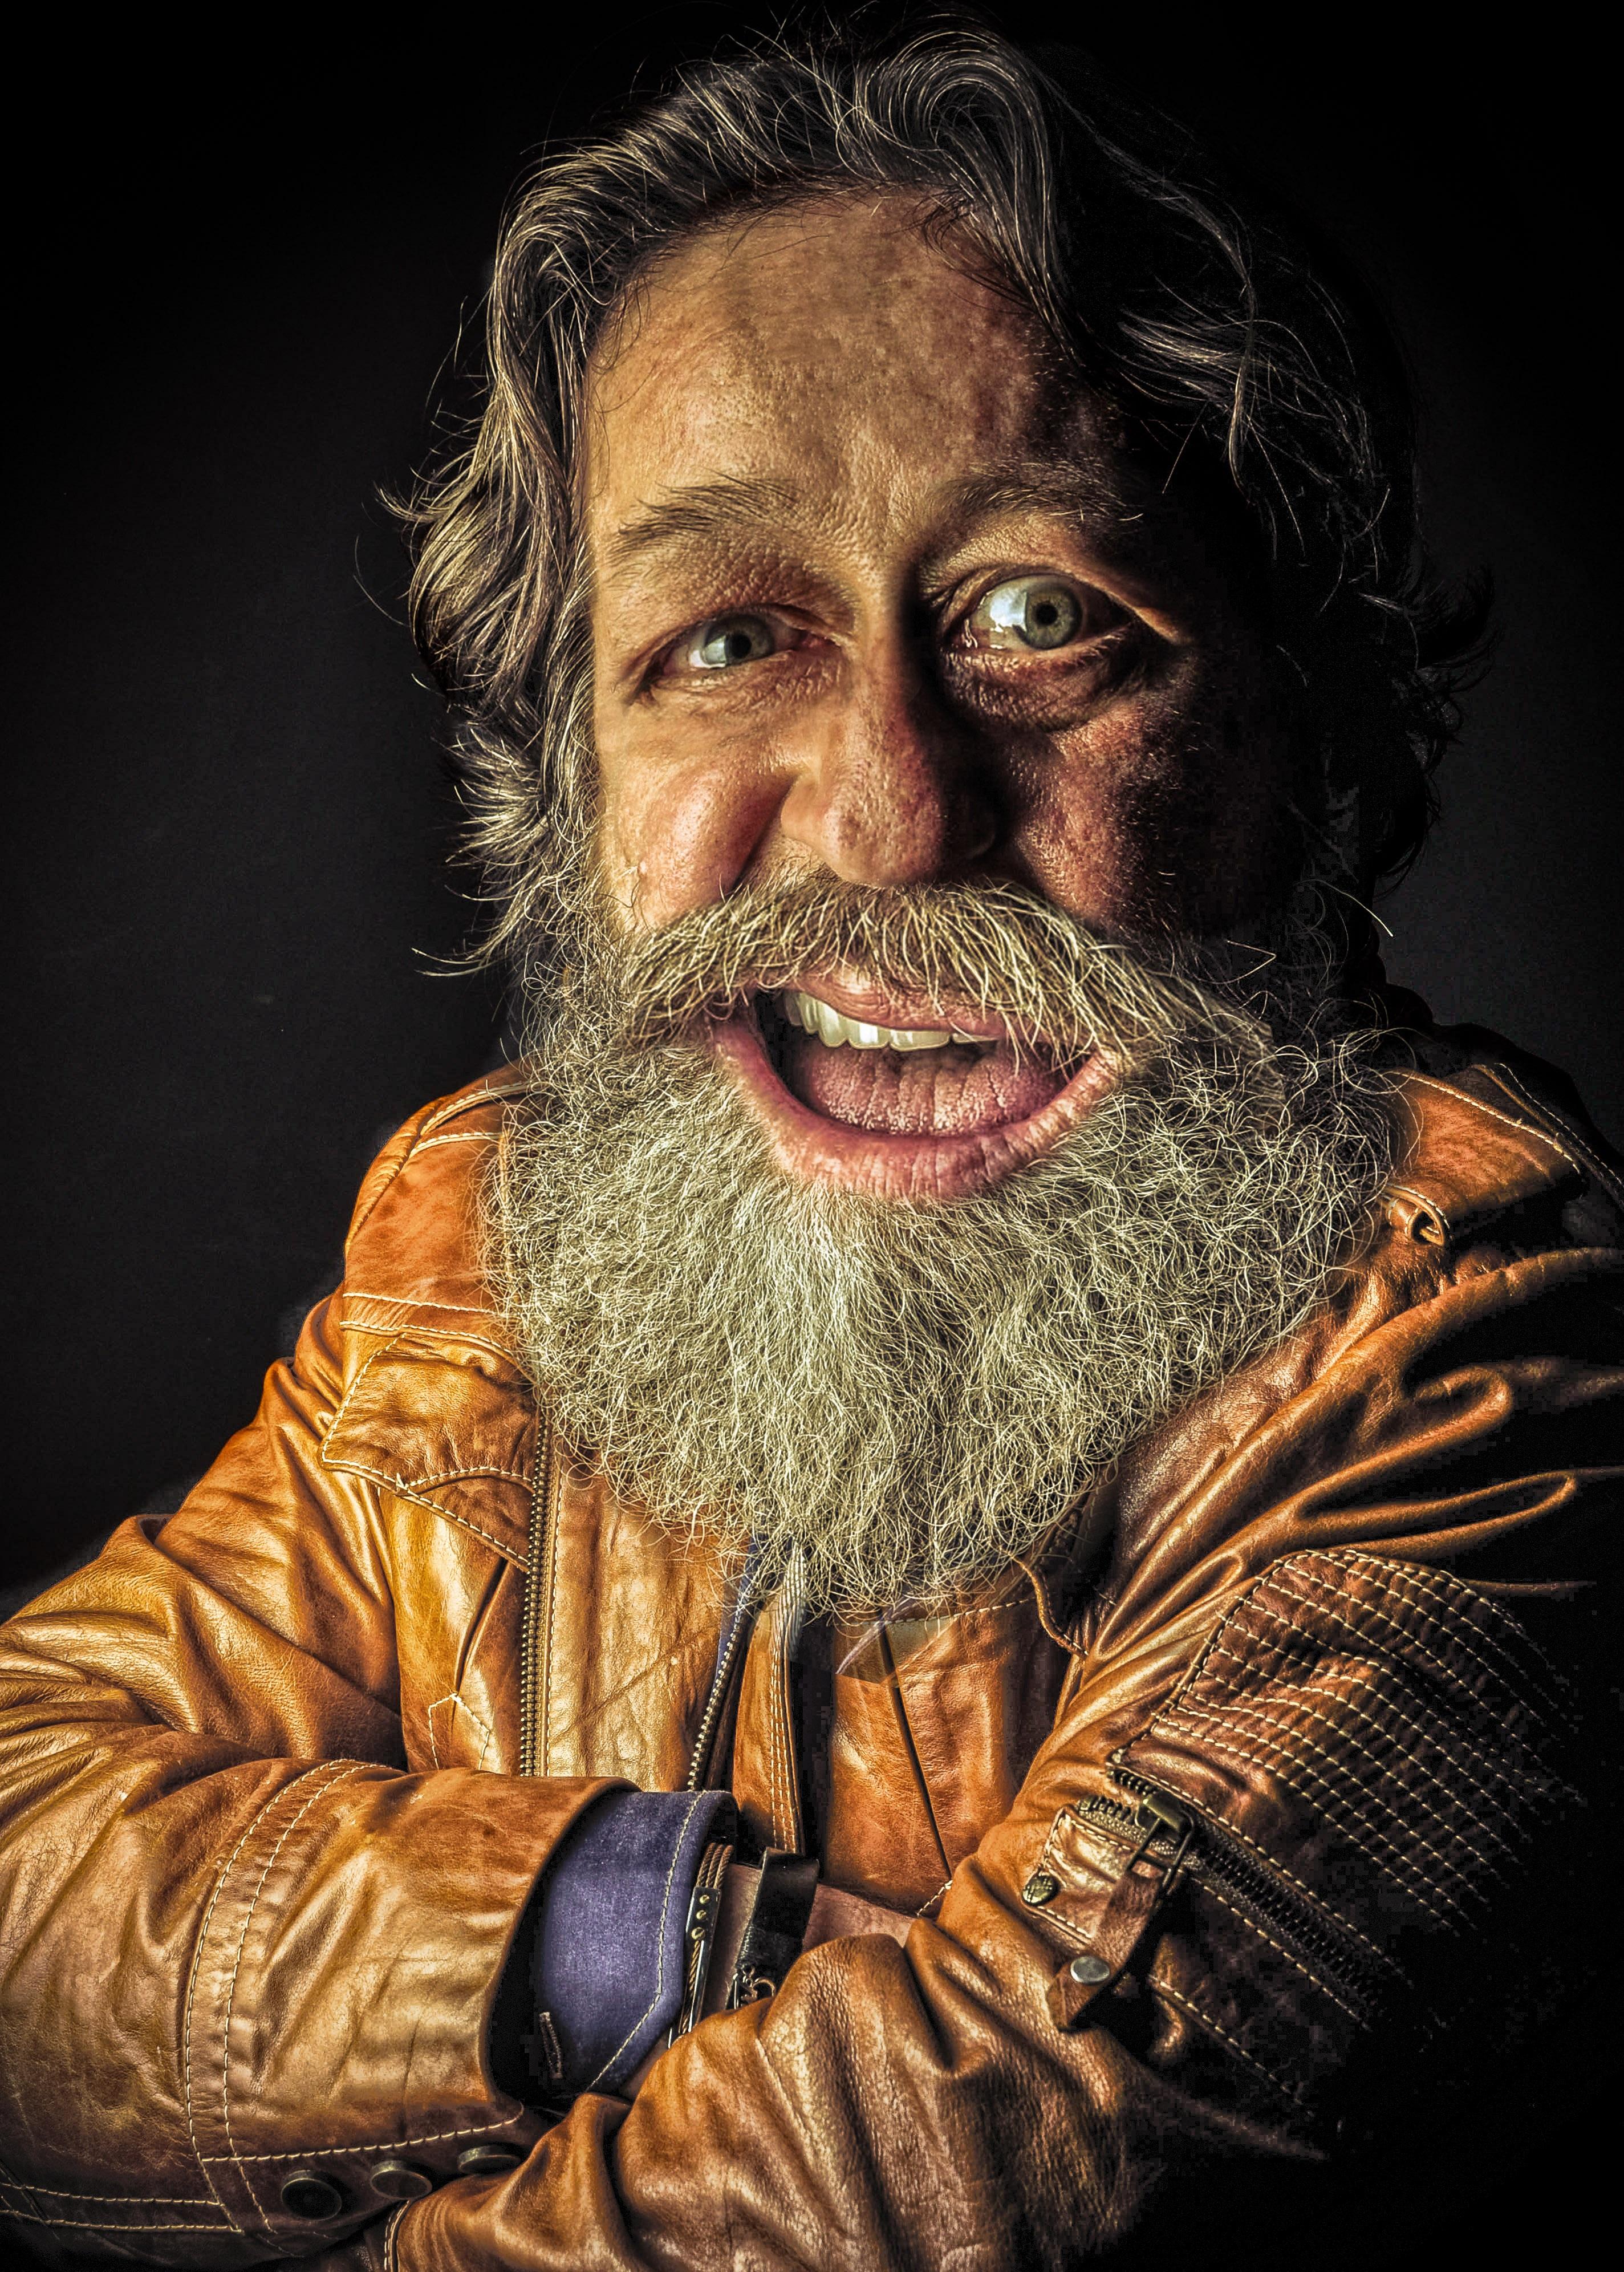 Gambar Manusia Orang Tua Pria Potret Artis Hairstyle